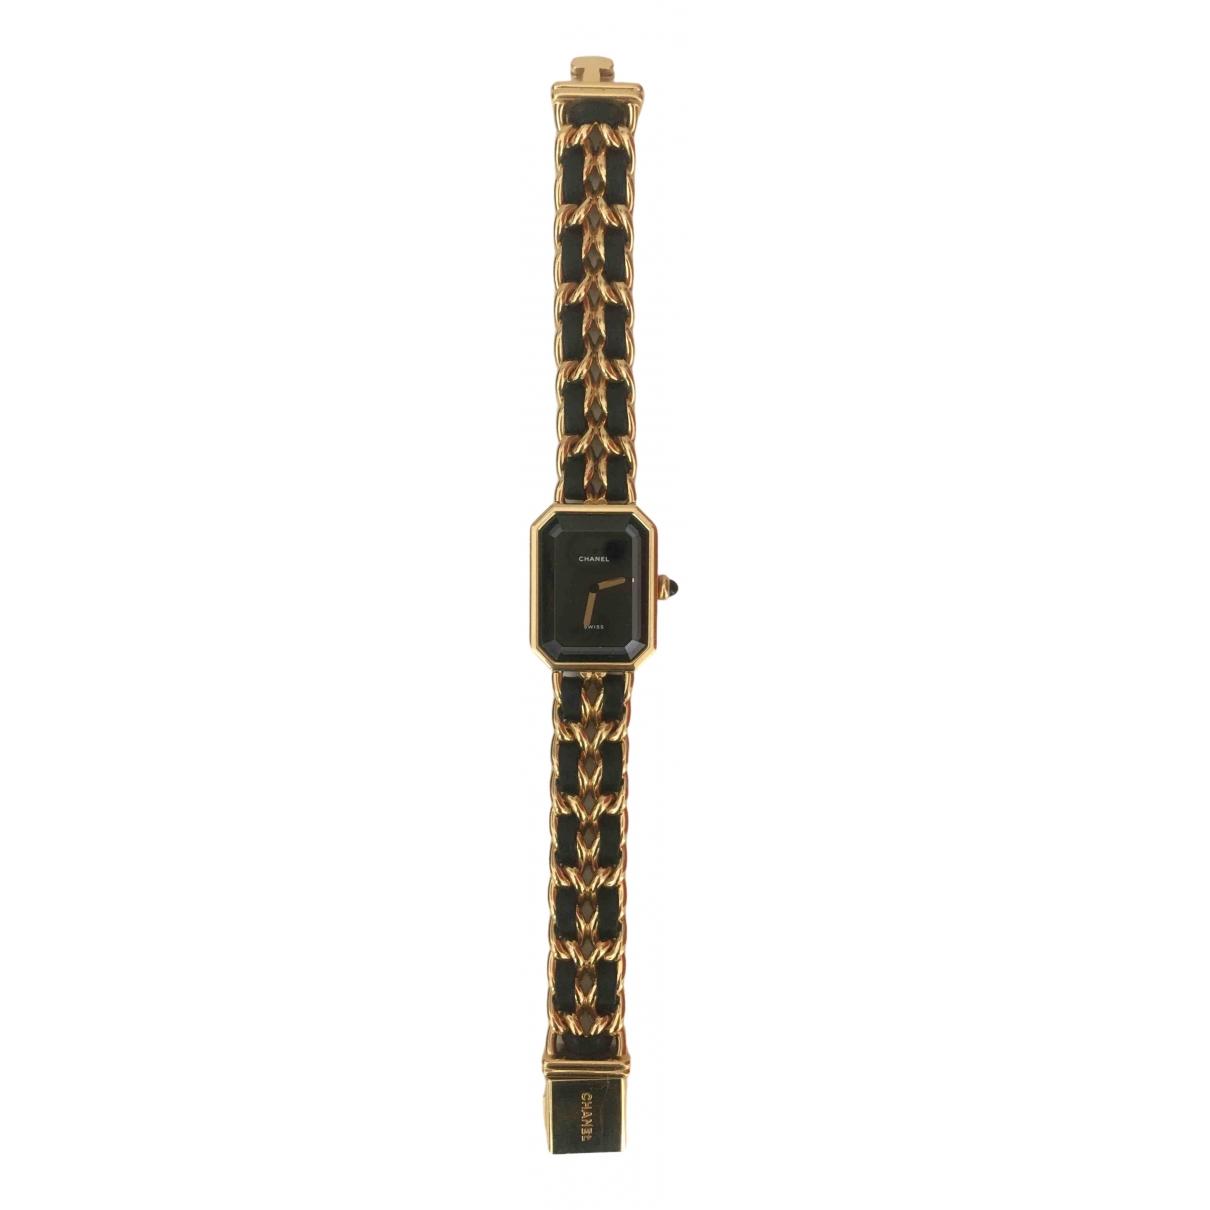 Chanel Premiere Uhr in  Gold Vergoldet